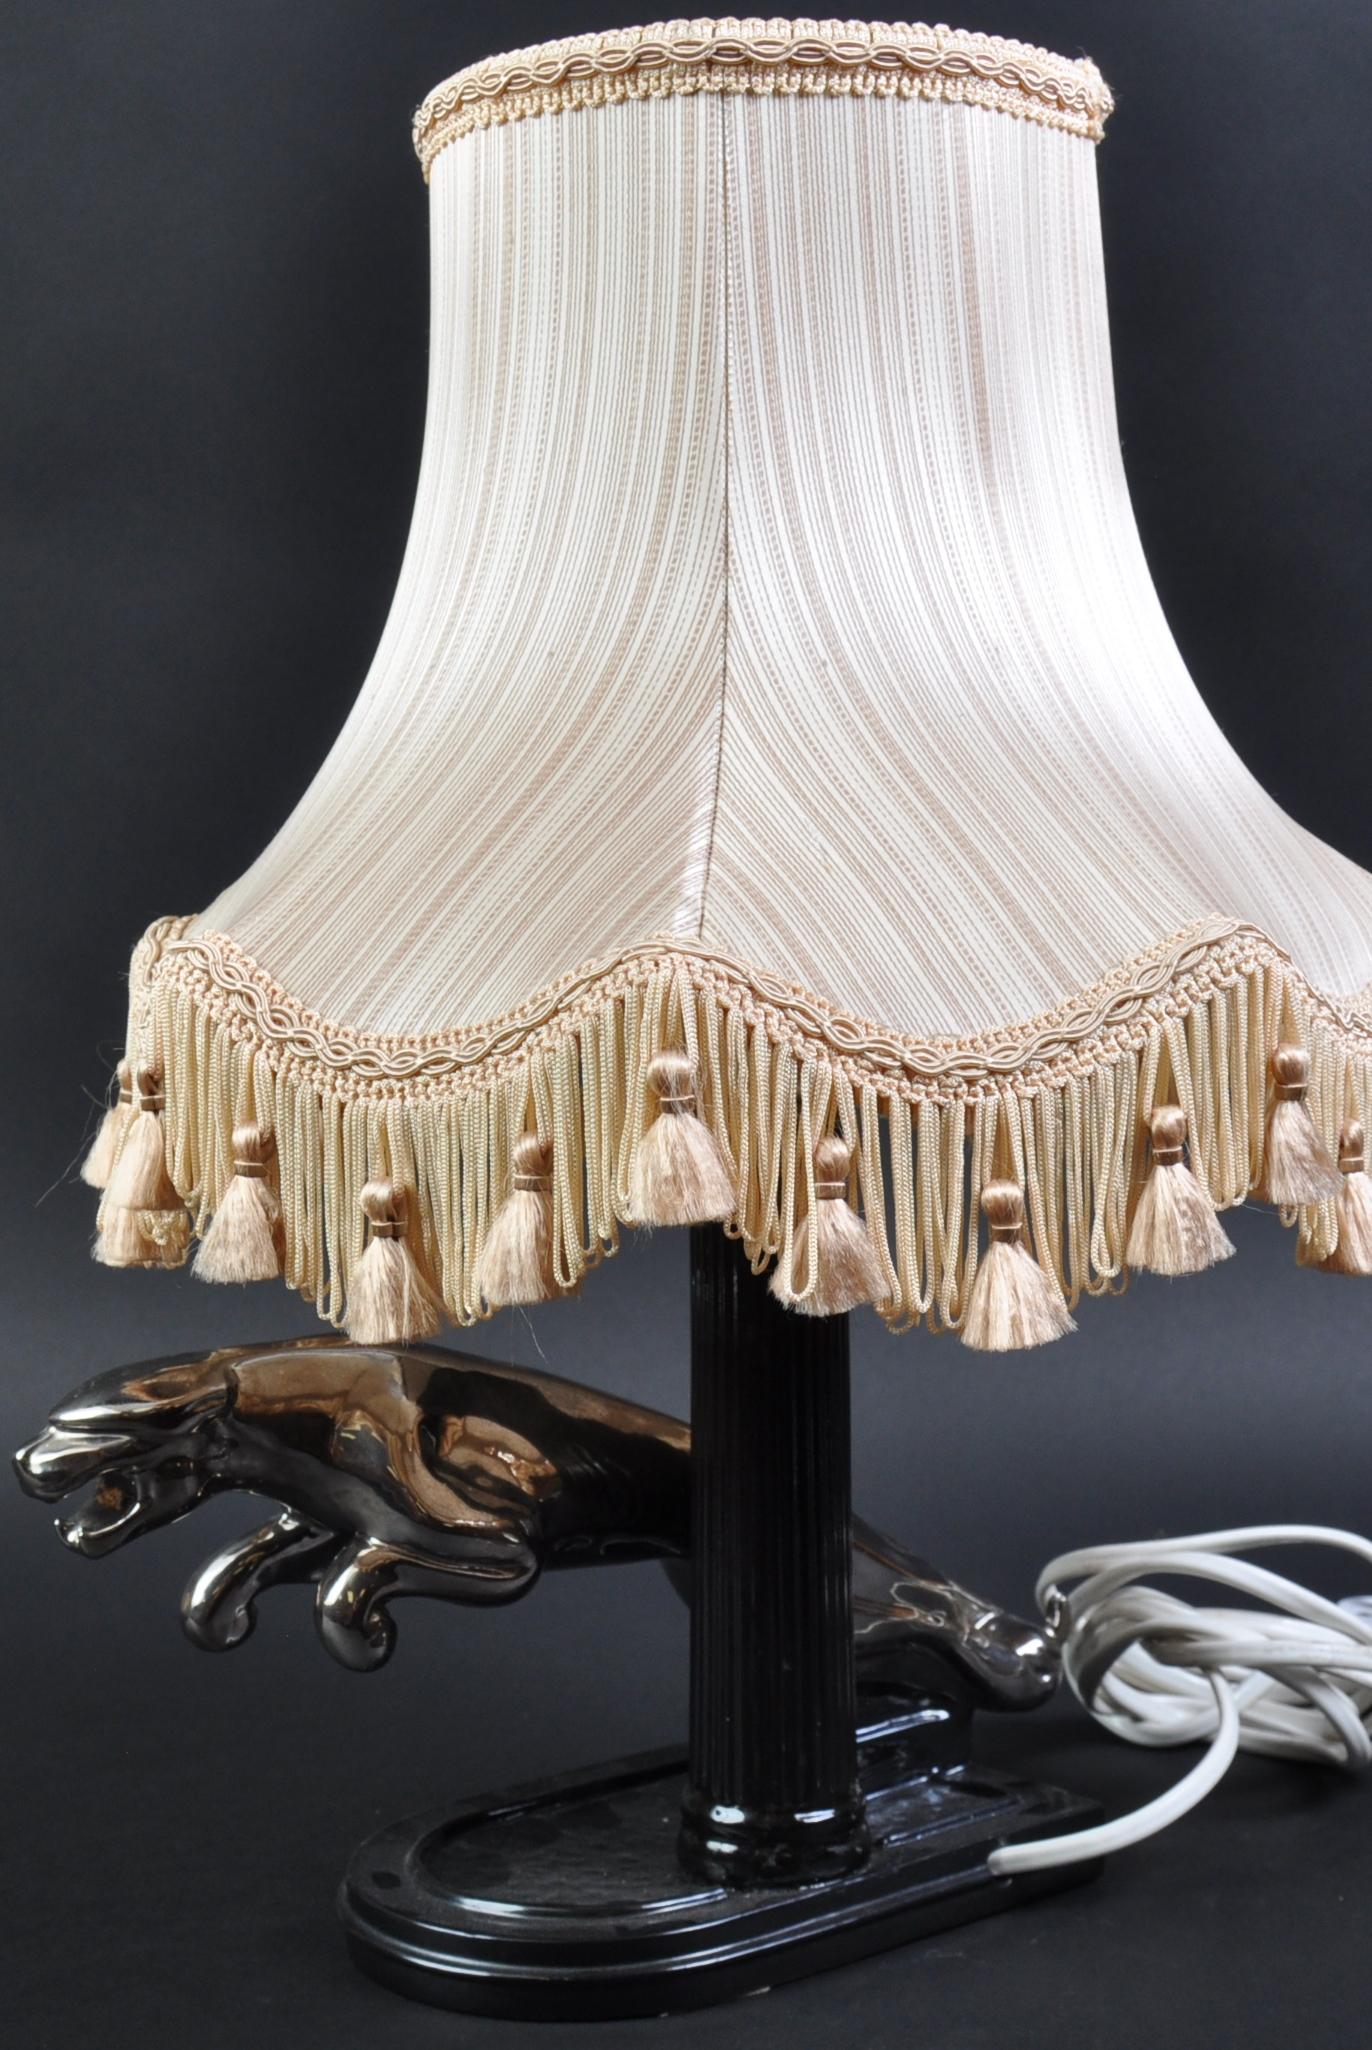 JAGUAR - ORIGINAL VINTAGE JAGUAR CHINA LAMP - Image 3 of 4